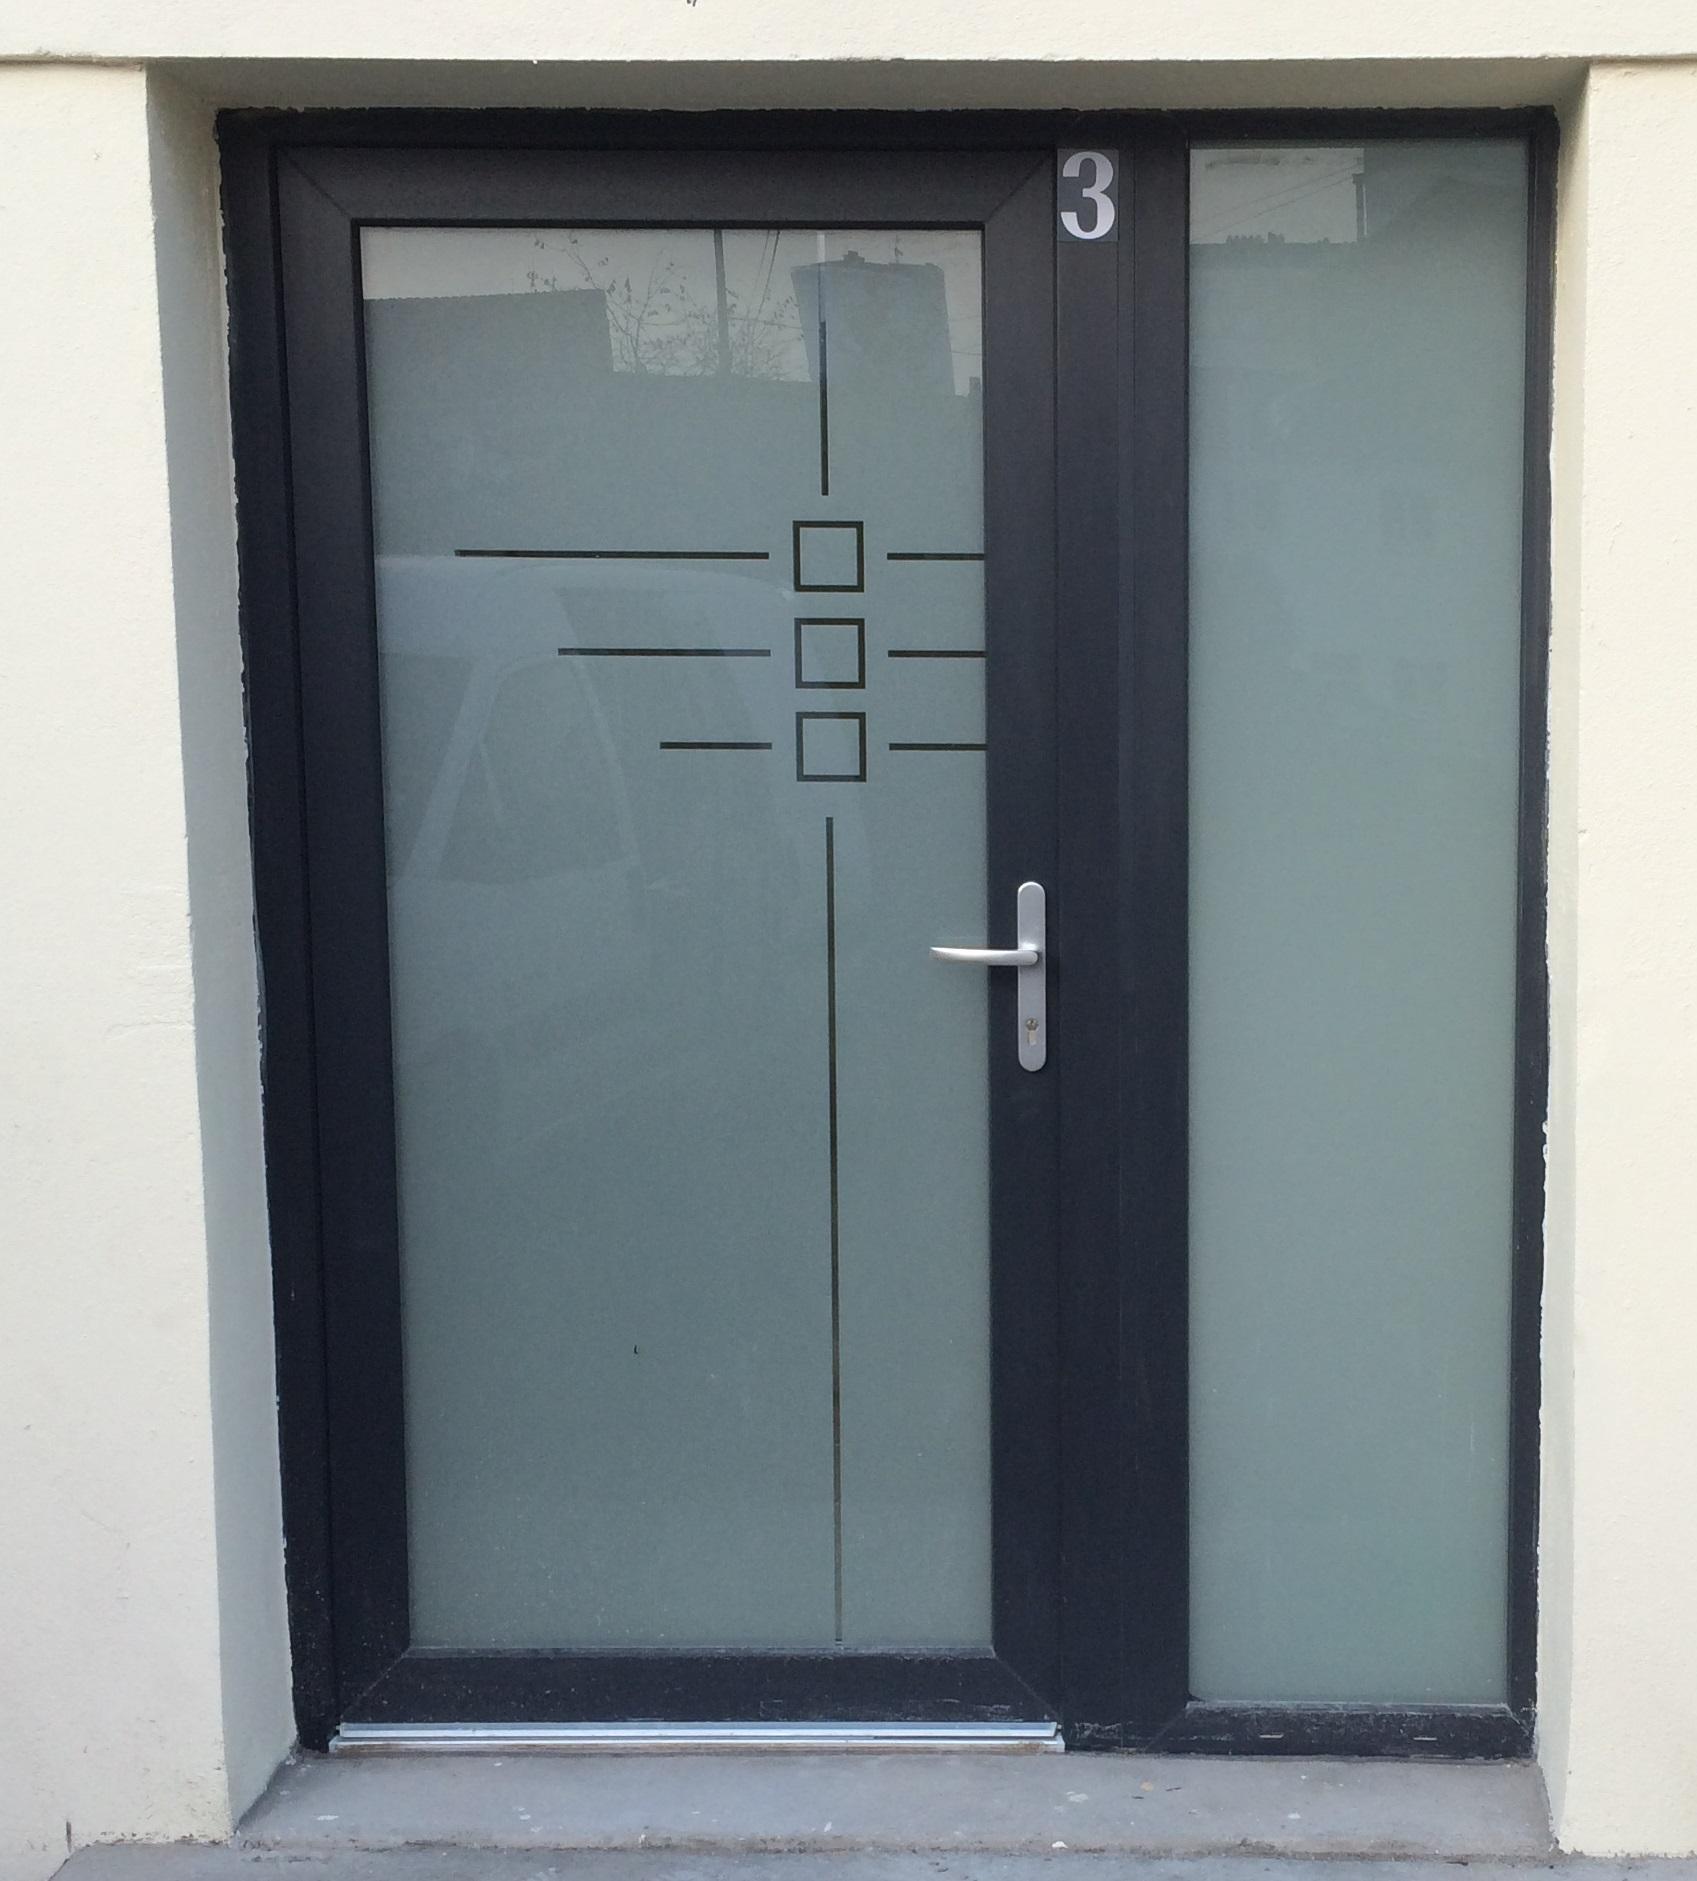 Porte azmenuiseries - Gedimat porte d entree ...